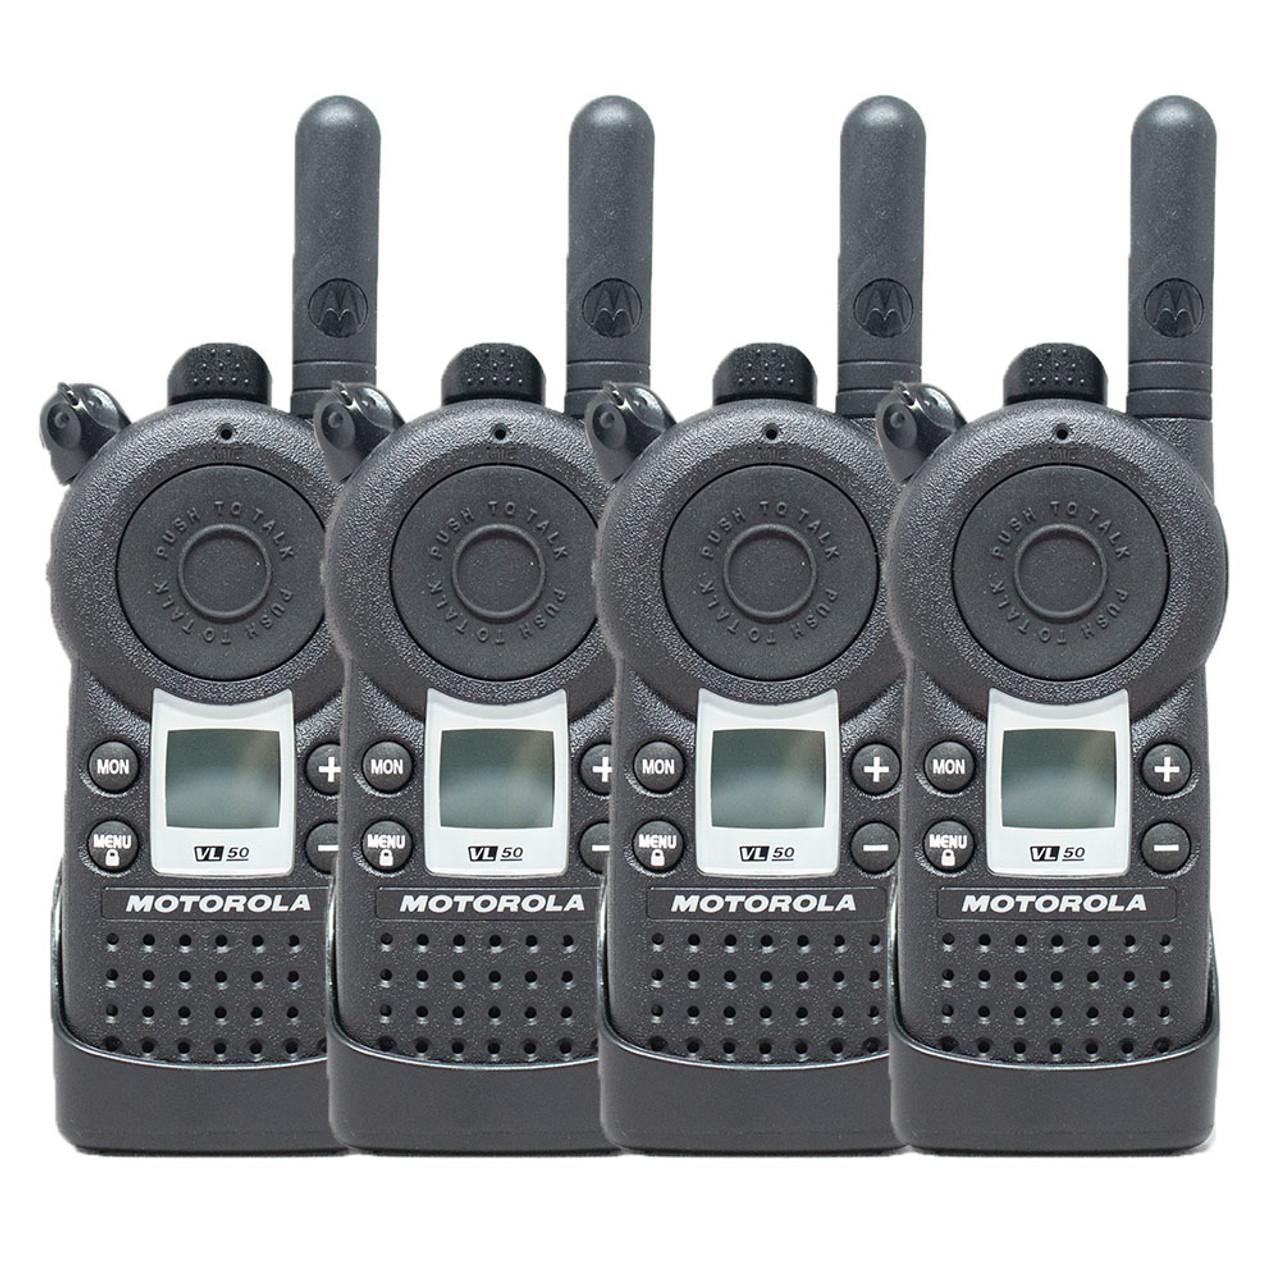 Motorola VL50 1 Watt 8 Channel UHF Two Way Radio Pack of 4